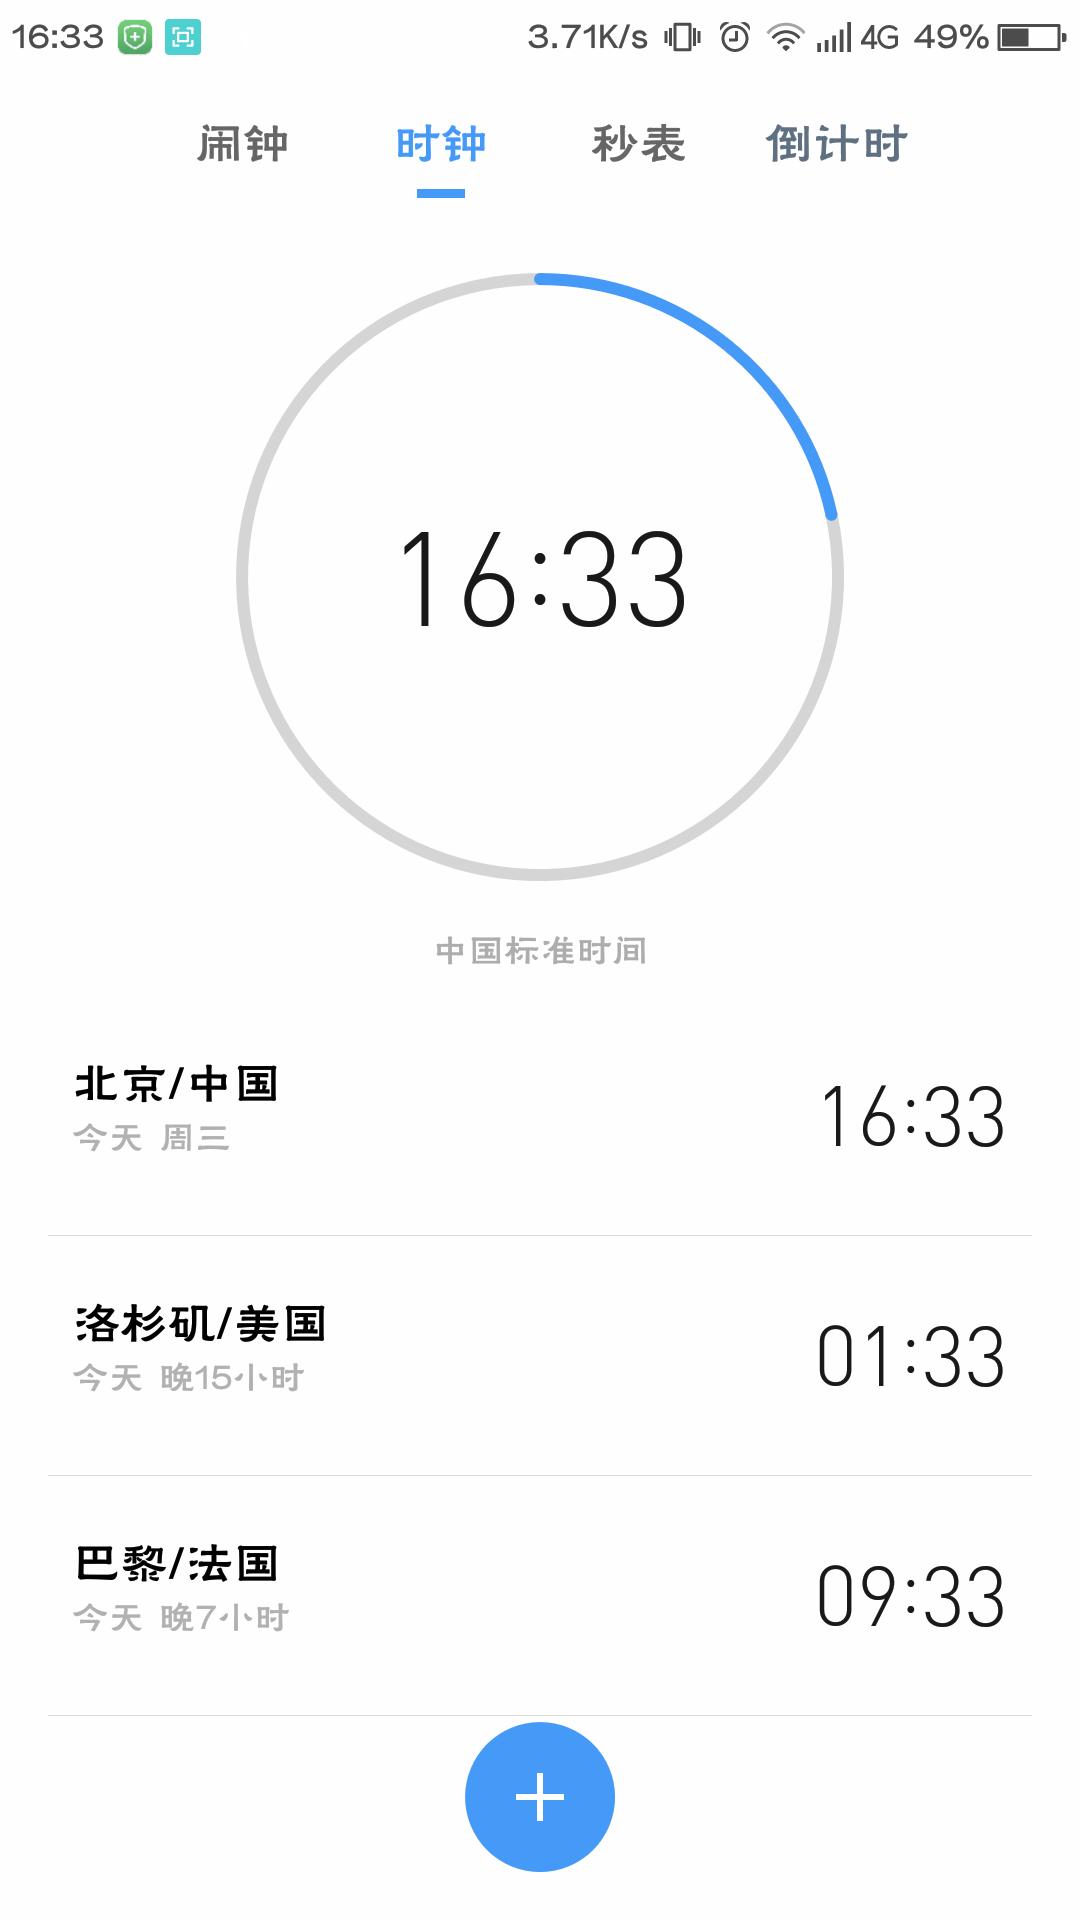 Screenshot_2017-11-01-16-33-15.png